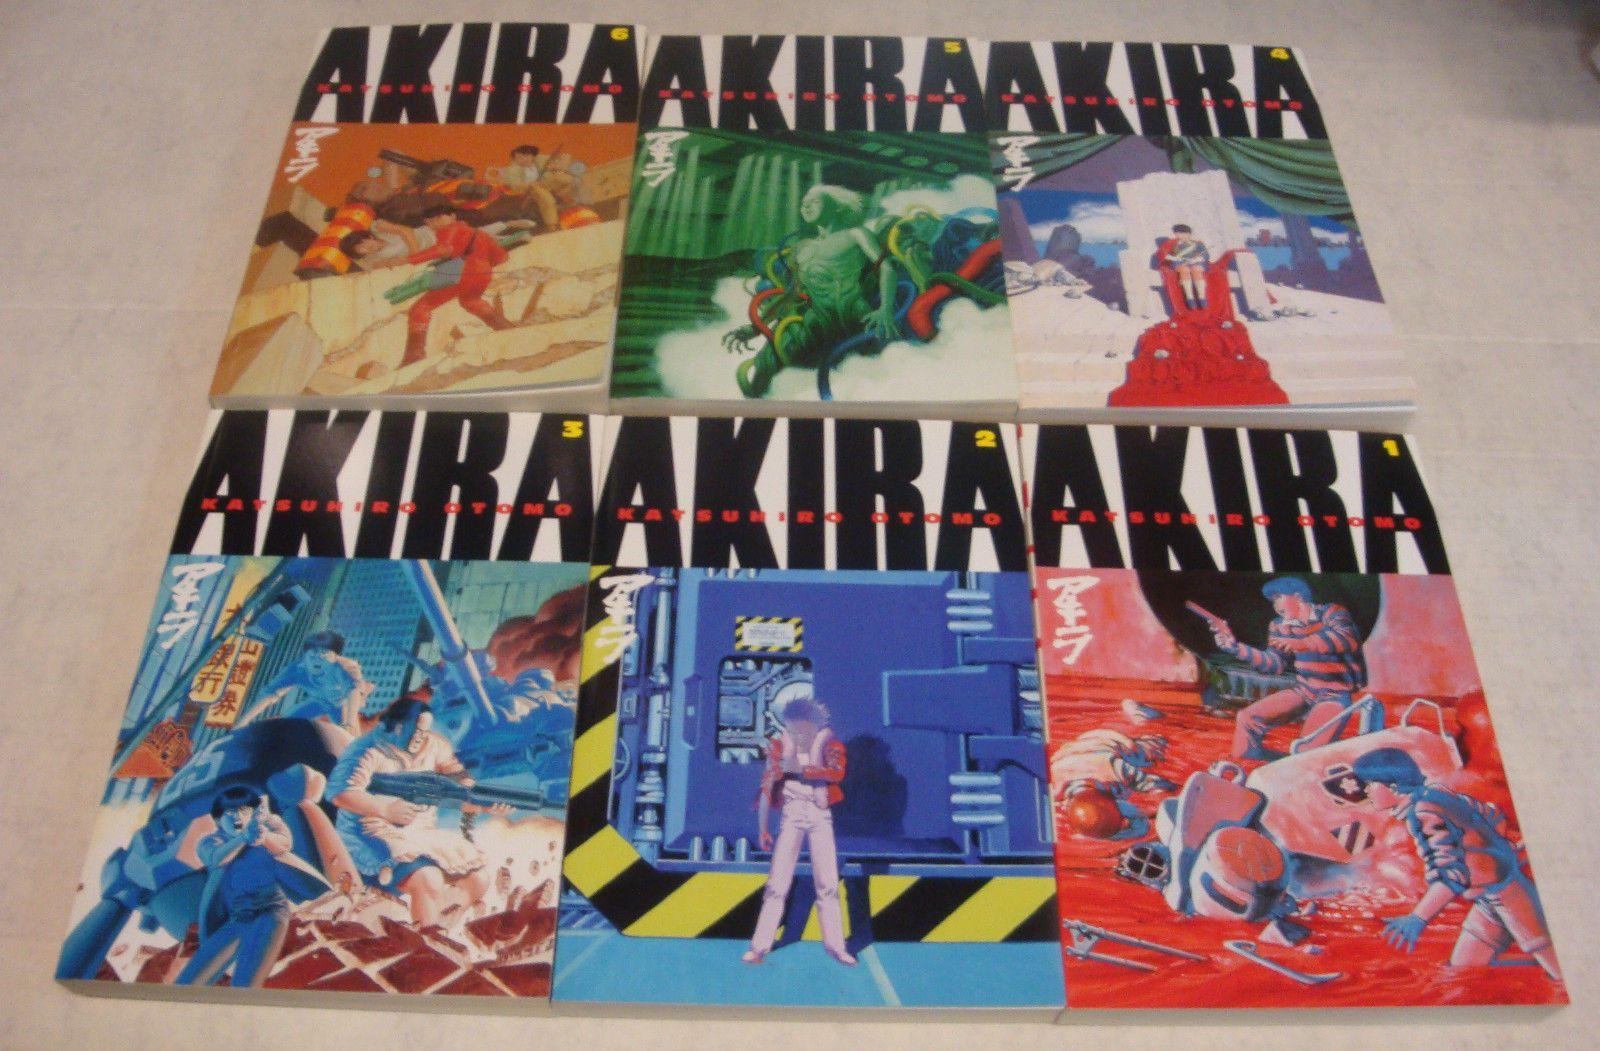 Akira Tpb Complete Set English Dark Horse Manga Volumes 1 6 Nm Condition Akira Dark Horse Manga